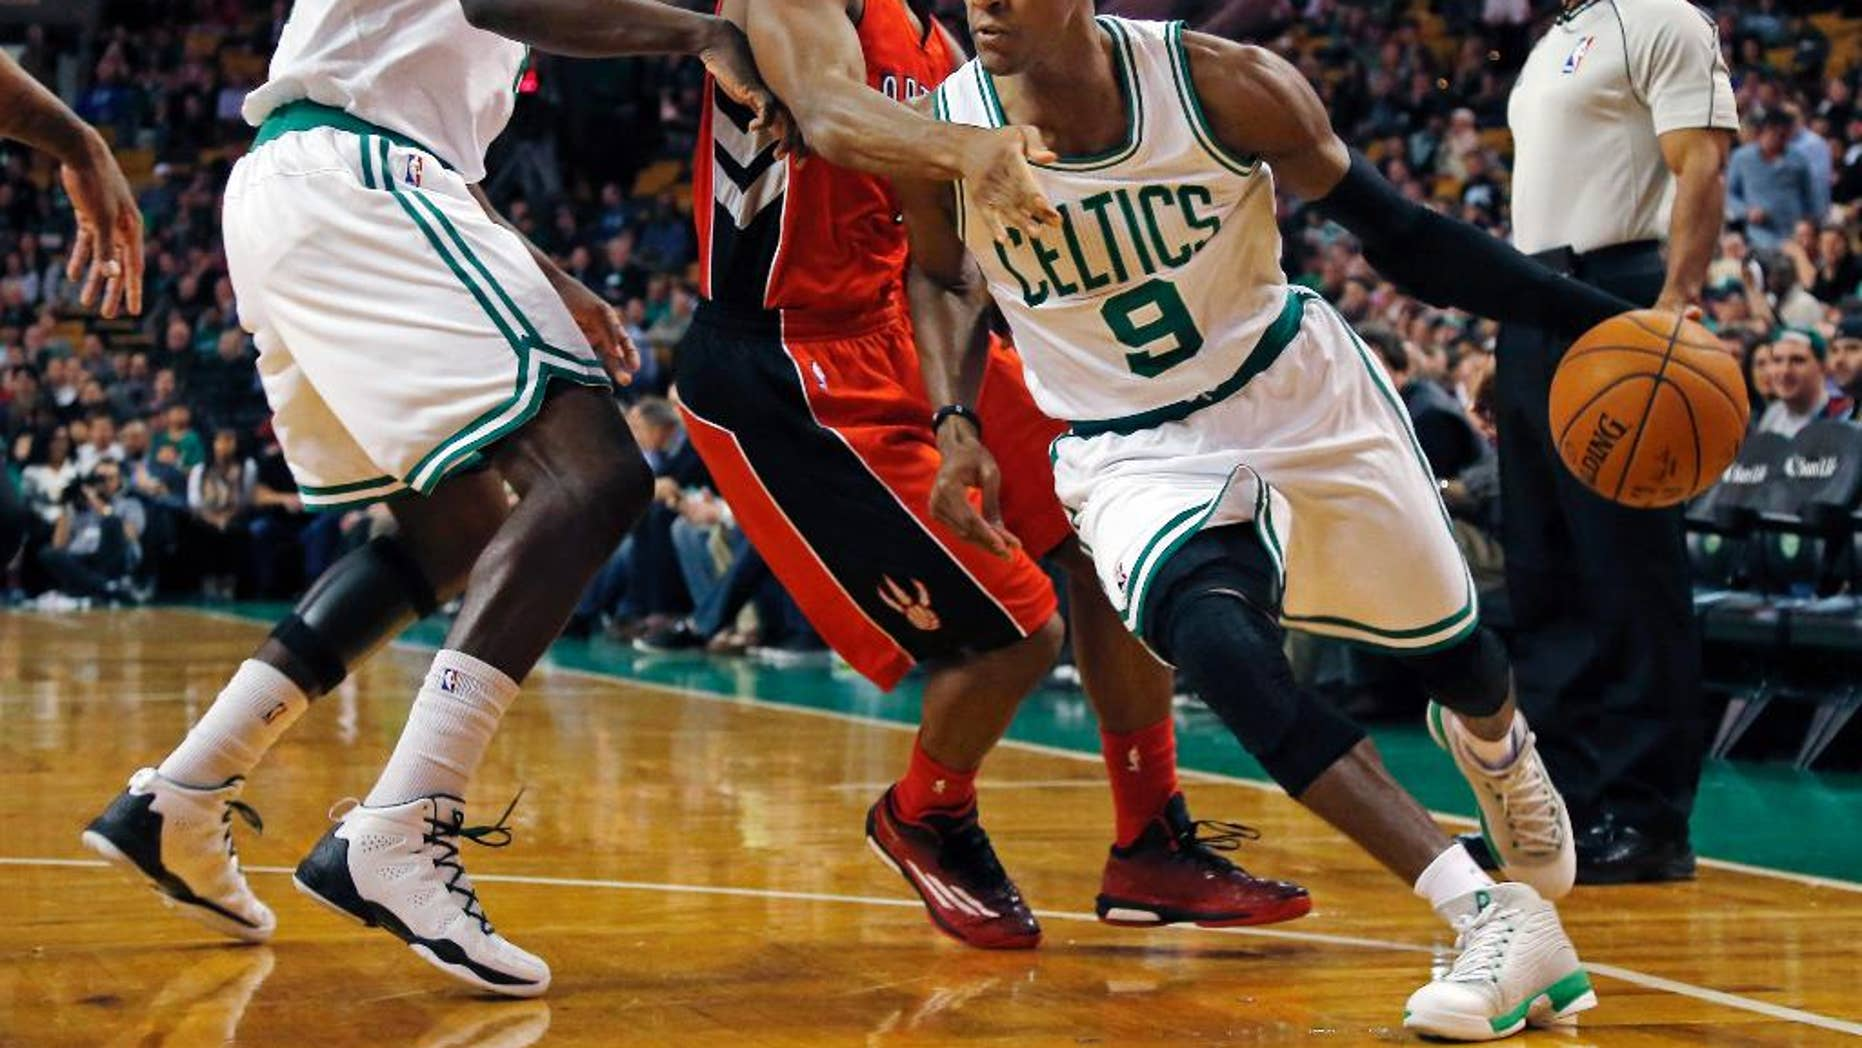 Boston Celtics guard Rajon Rondo (9) drives past Toronto Raptors guard Kyle Lowry, middle, during the first quarter of an NBA basketball game in Boston, Wednesday, Nov. 5, 2014. (AP Photo/Elise Amendola)